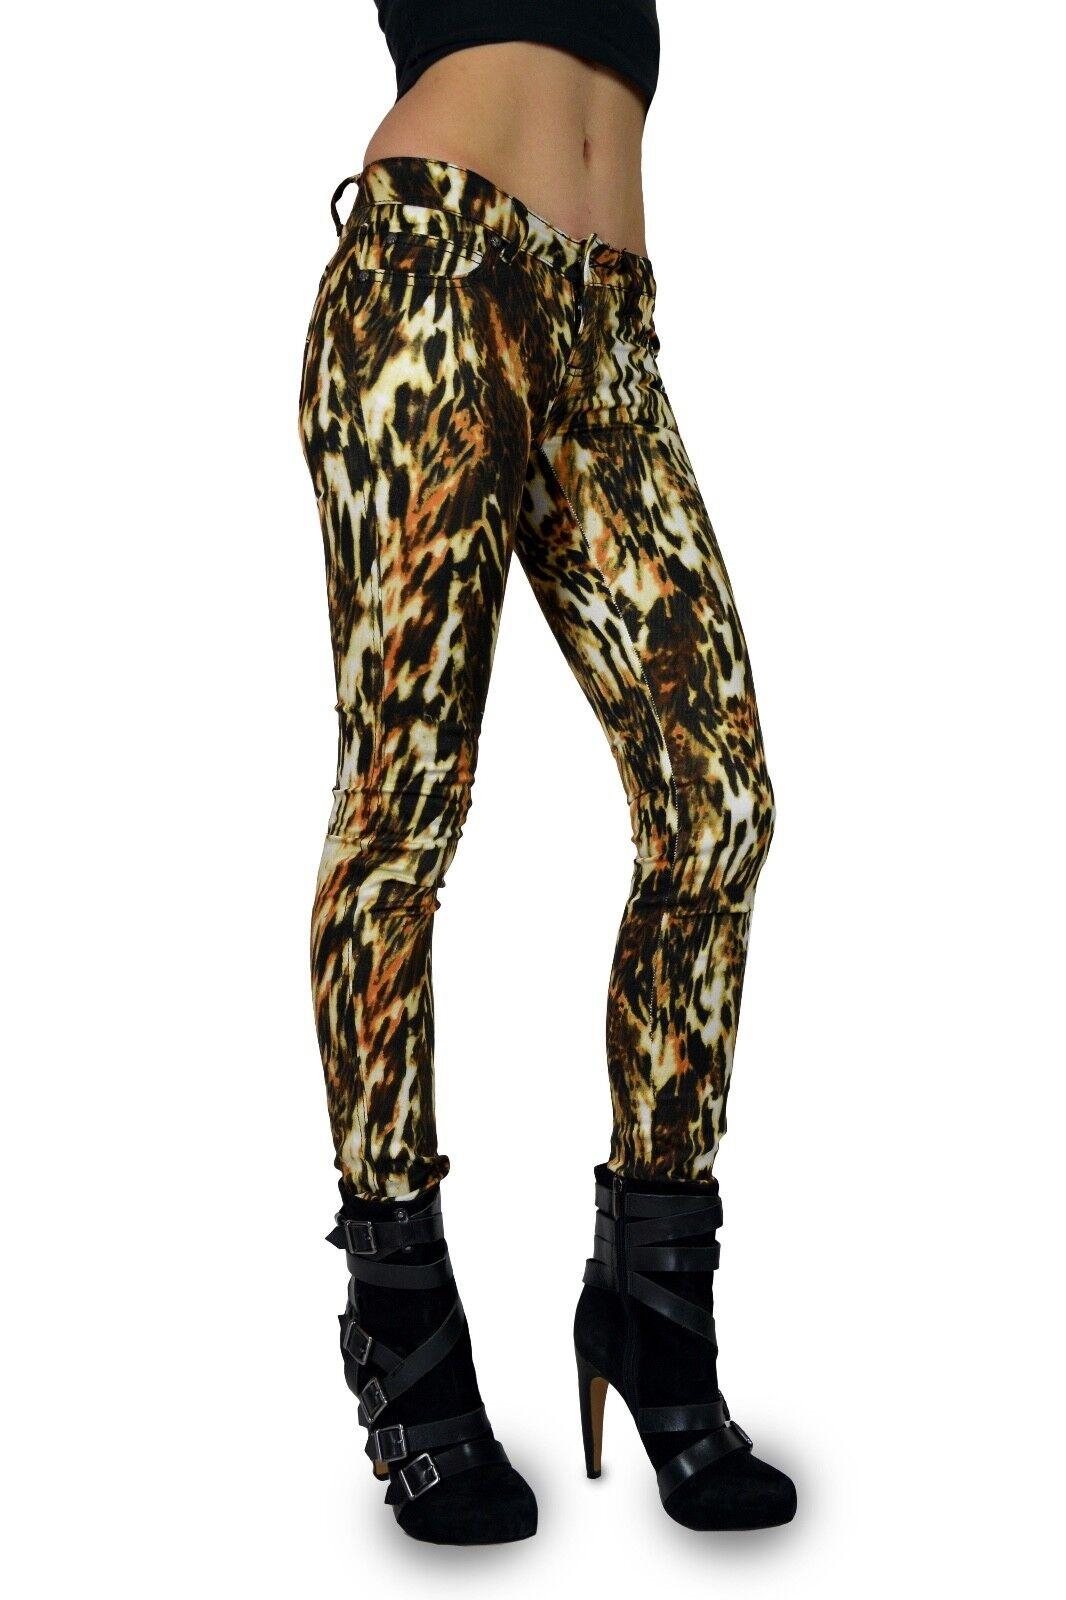 TRIPP EMO GOTH PUNK ROCKER JUNGLE CAT PRINTED JEANS PANTS SKINNY METAL IL8833P Clothing, Shoes & Accessories